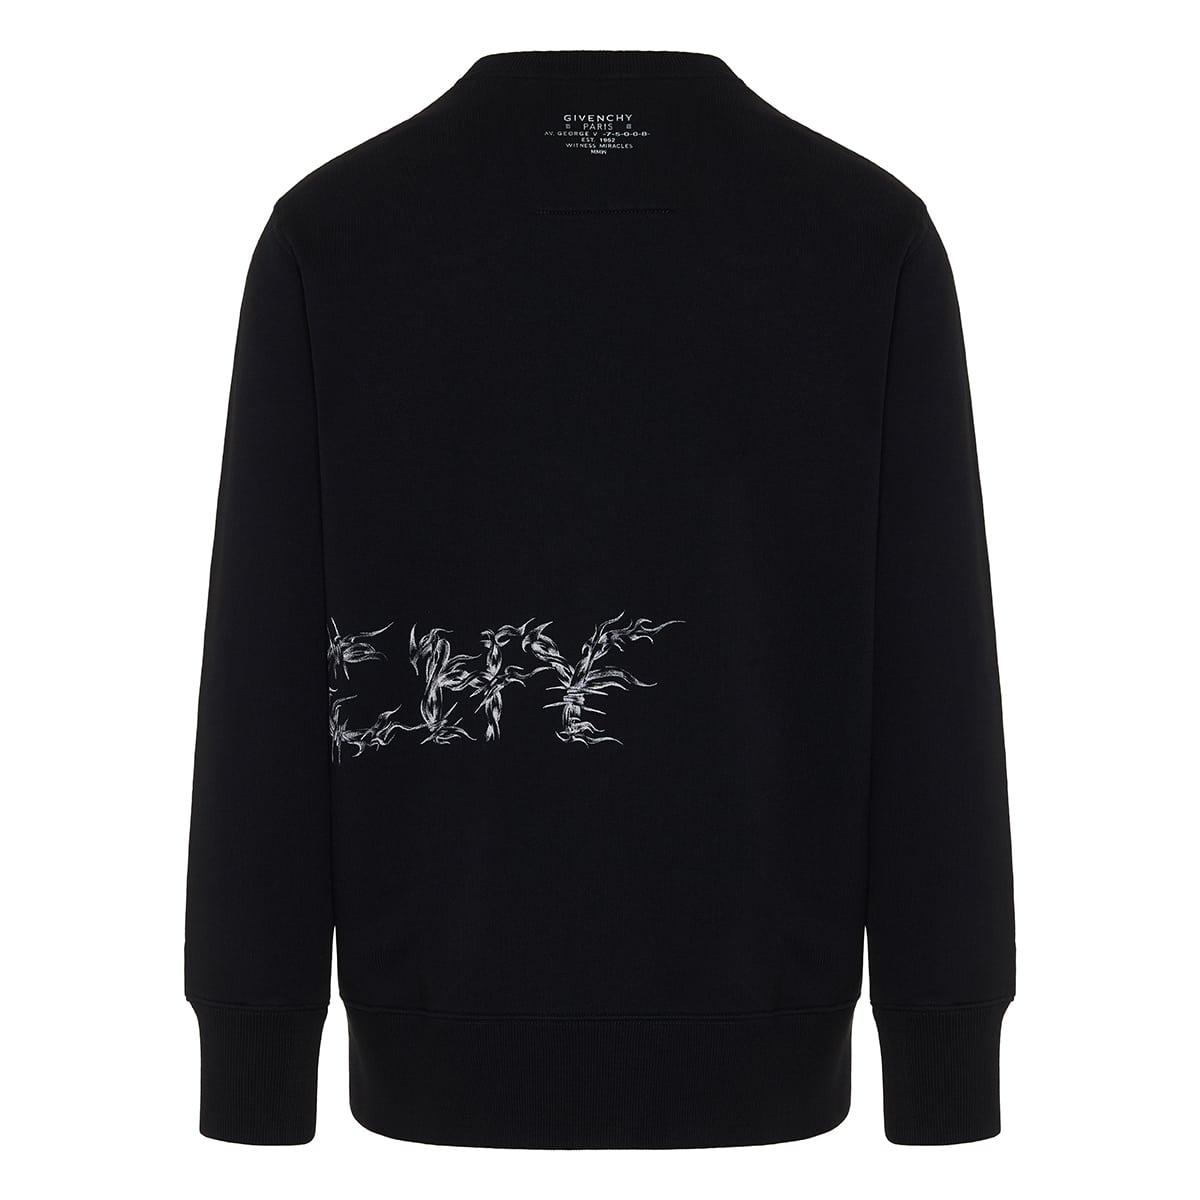 Barbed wire oversized logo sweatshirt